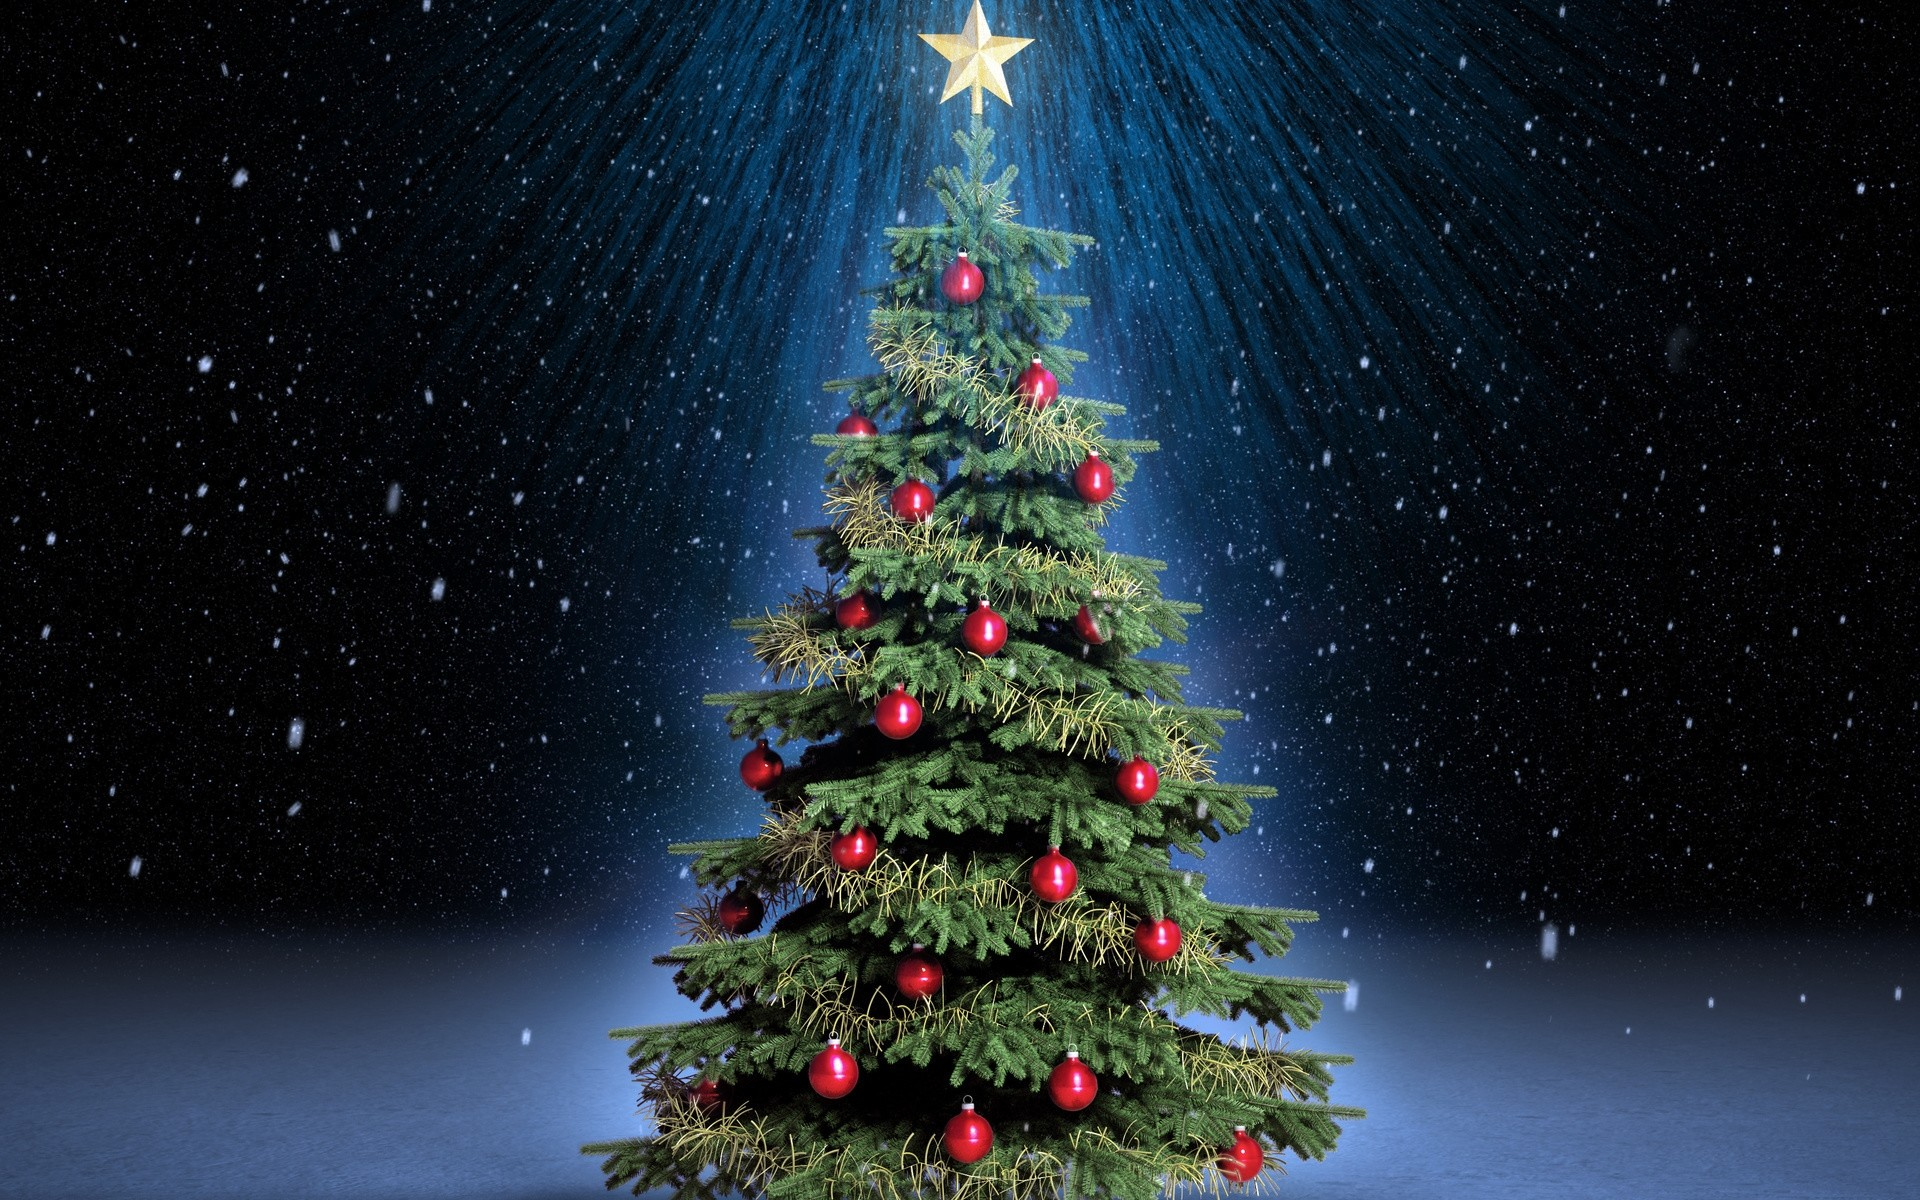 Merry Christmas Tree Wallpaper (18)